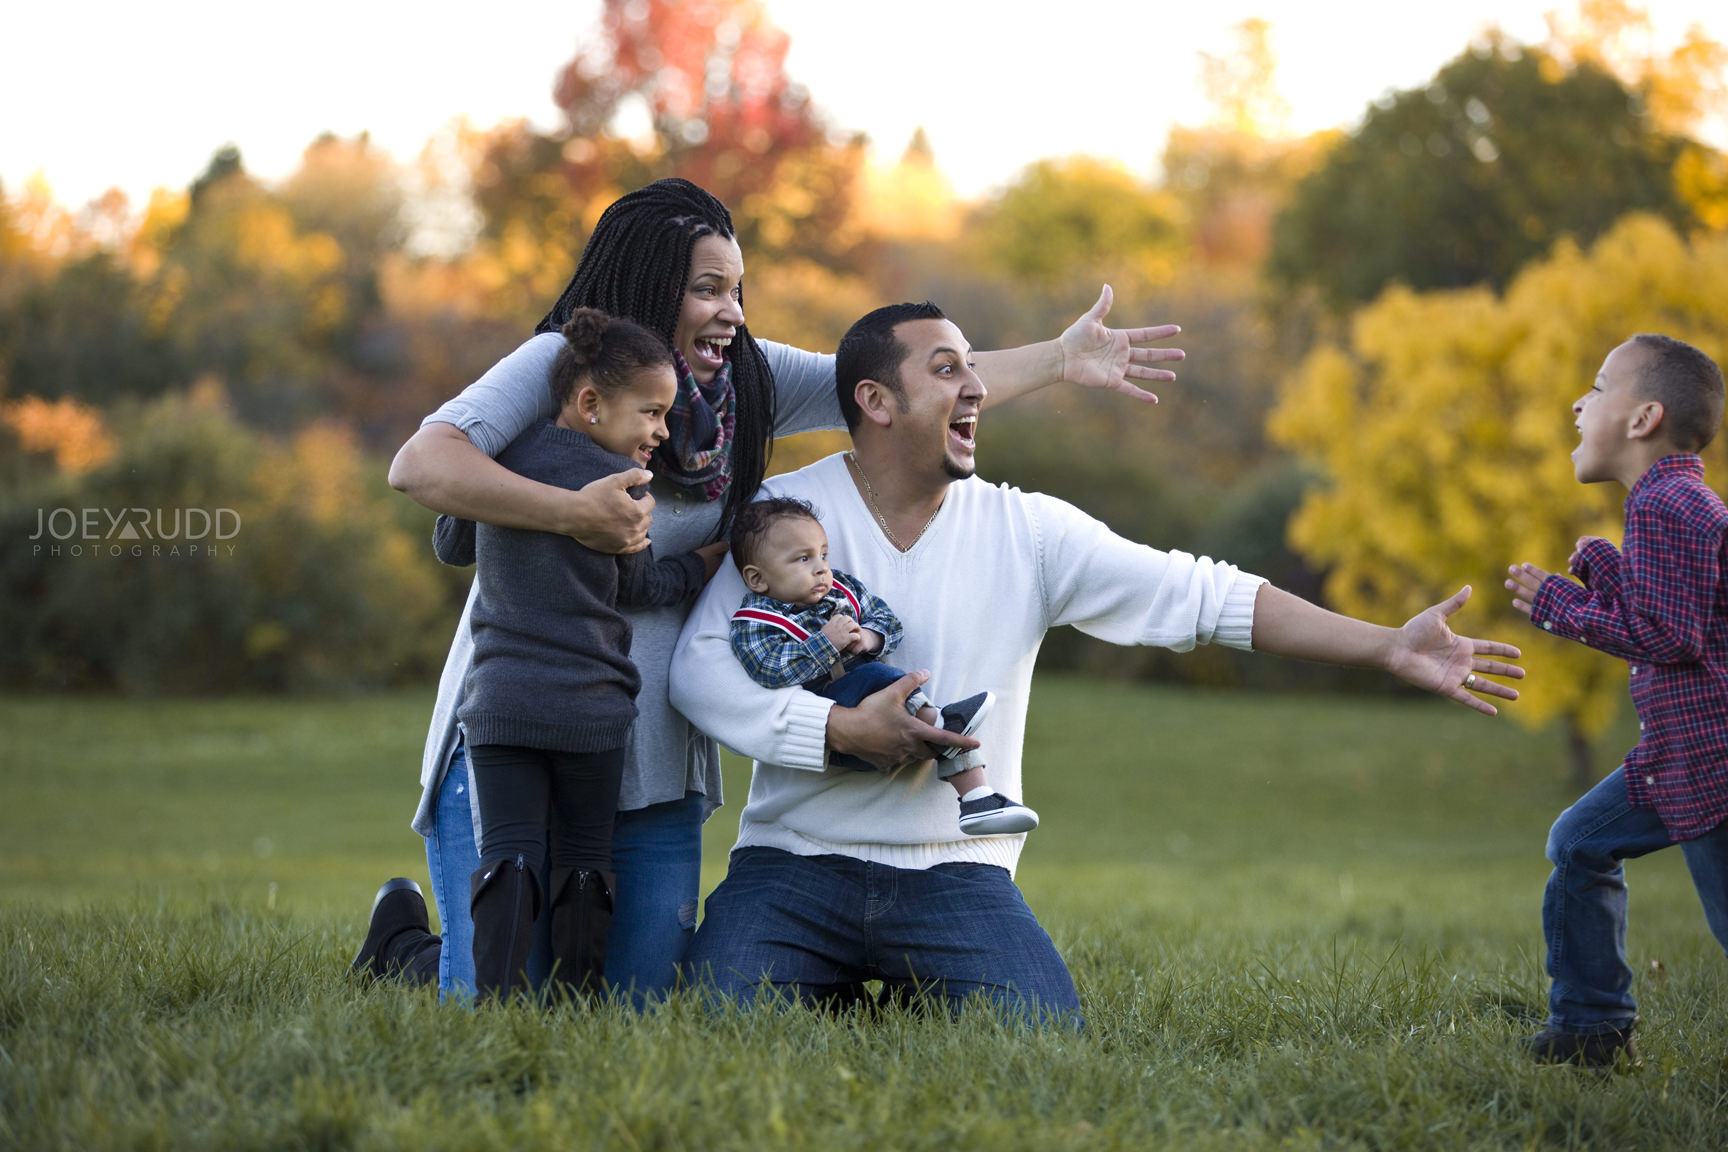 Ottawa Family Photographer Joey Rudd Photography Family Photo Session Arboretum Candid Reality